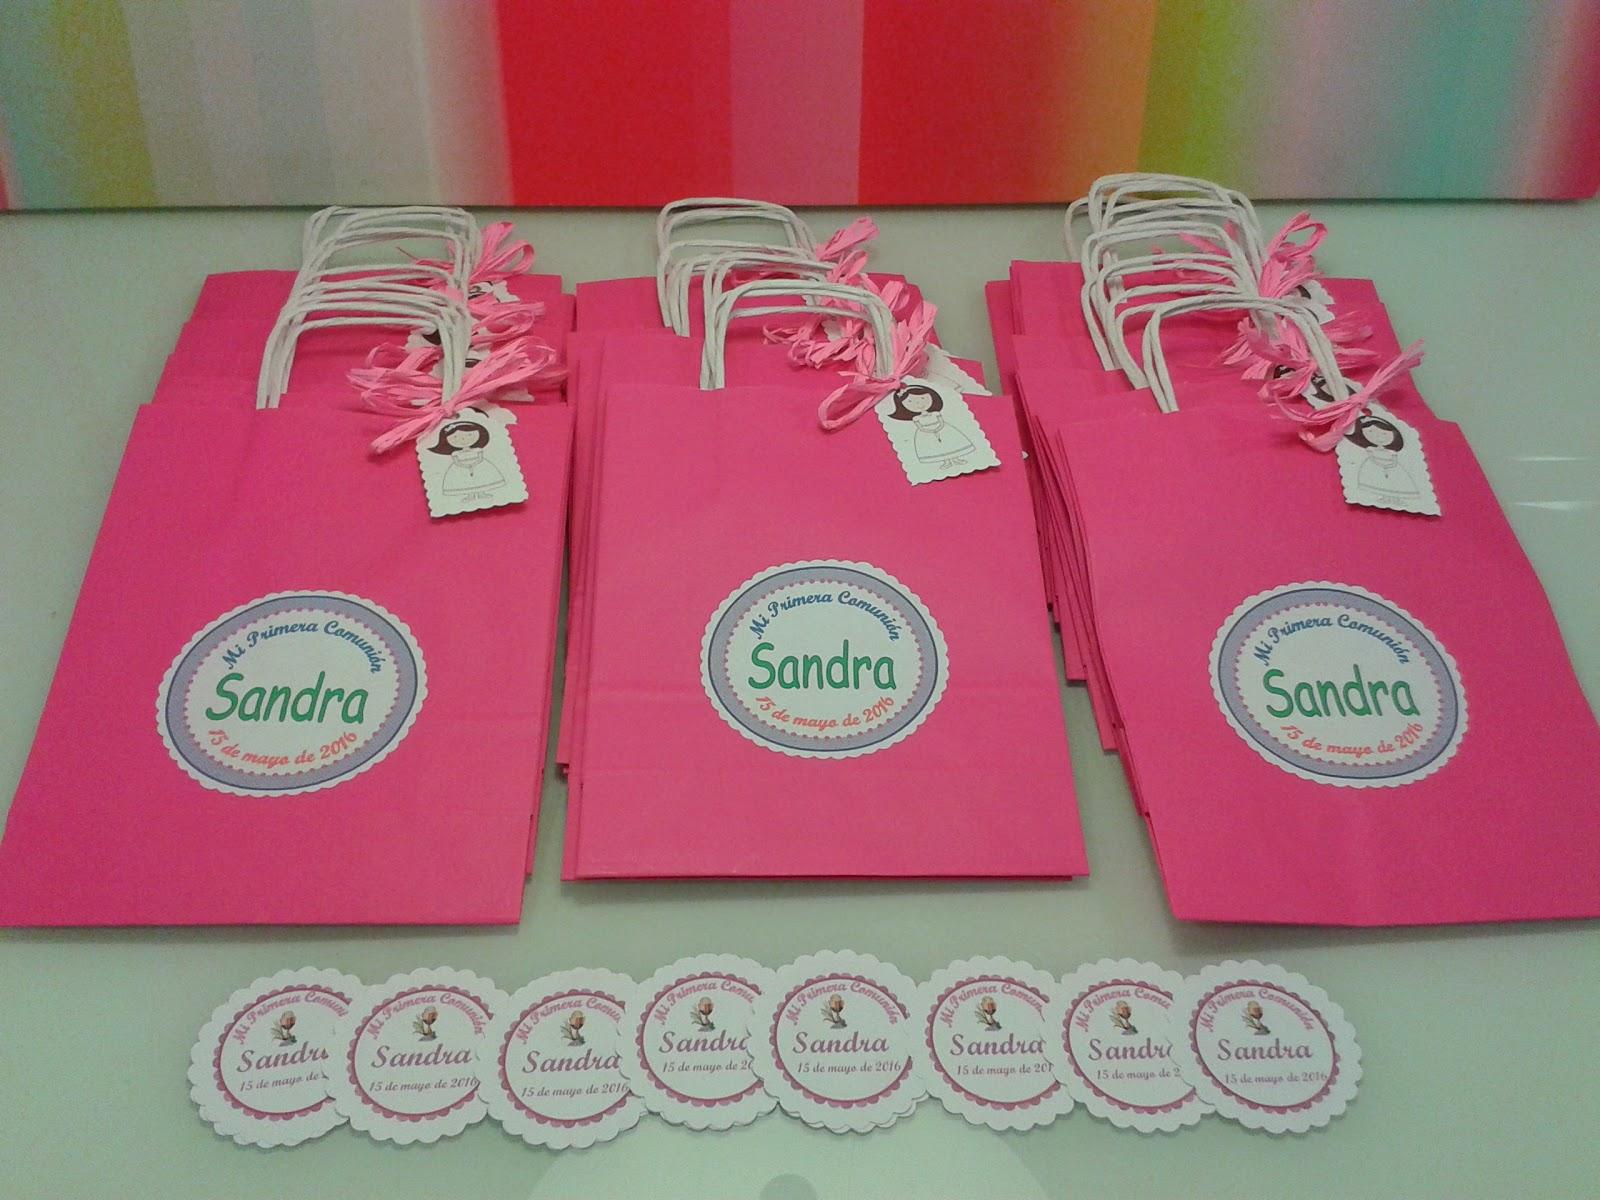 Chuchedetalles pamplona bolsas personalizadas y etiquetas - Bolsas de regalo personalizadas ...